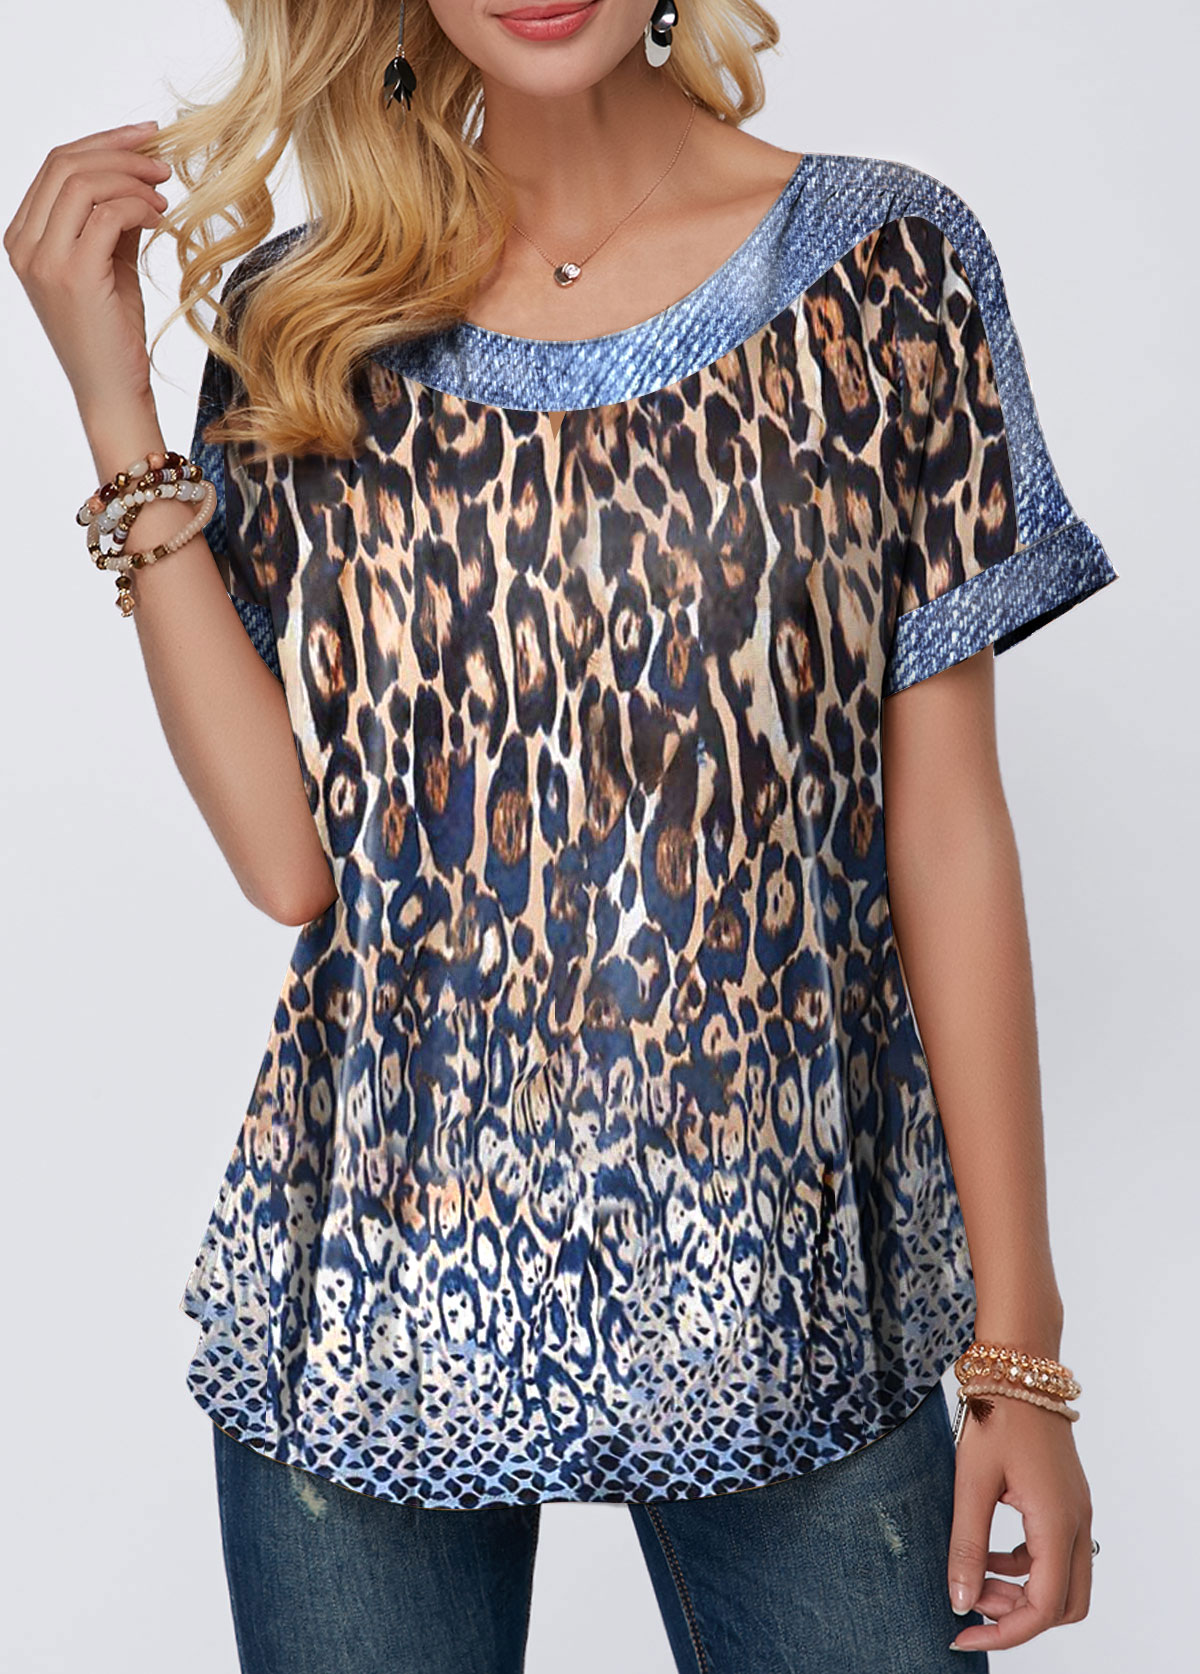 Leopard Print Short Sleeve Round Neck Blouse